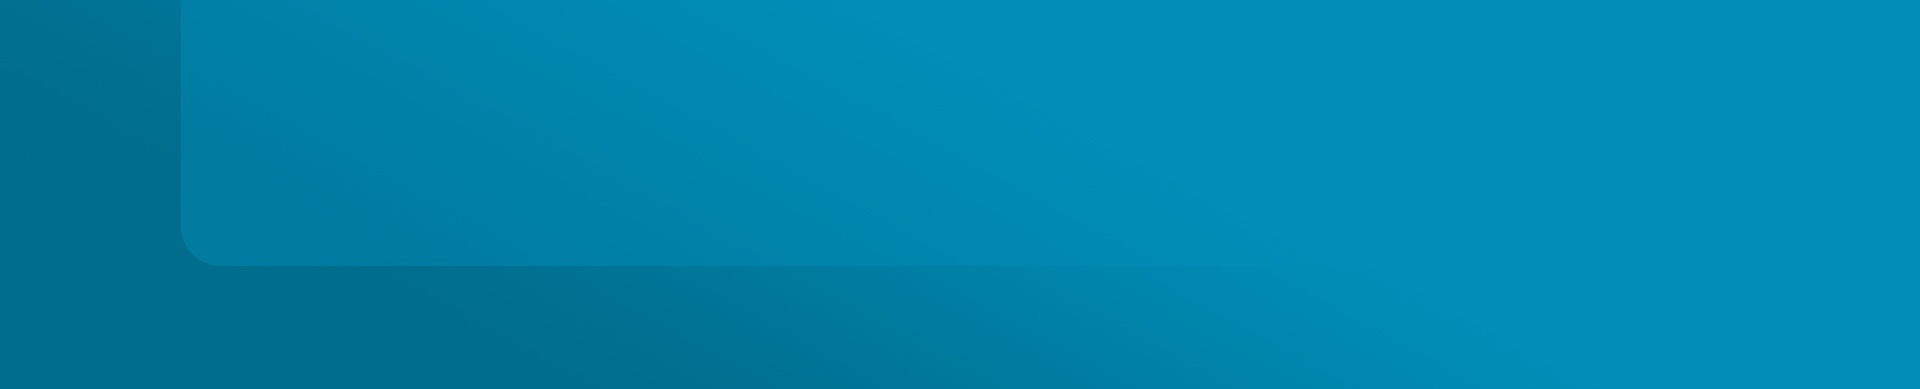 blue-background-banner